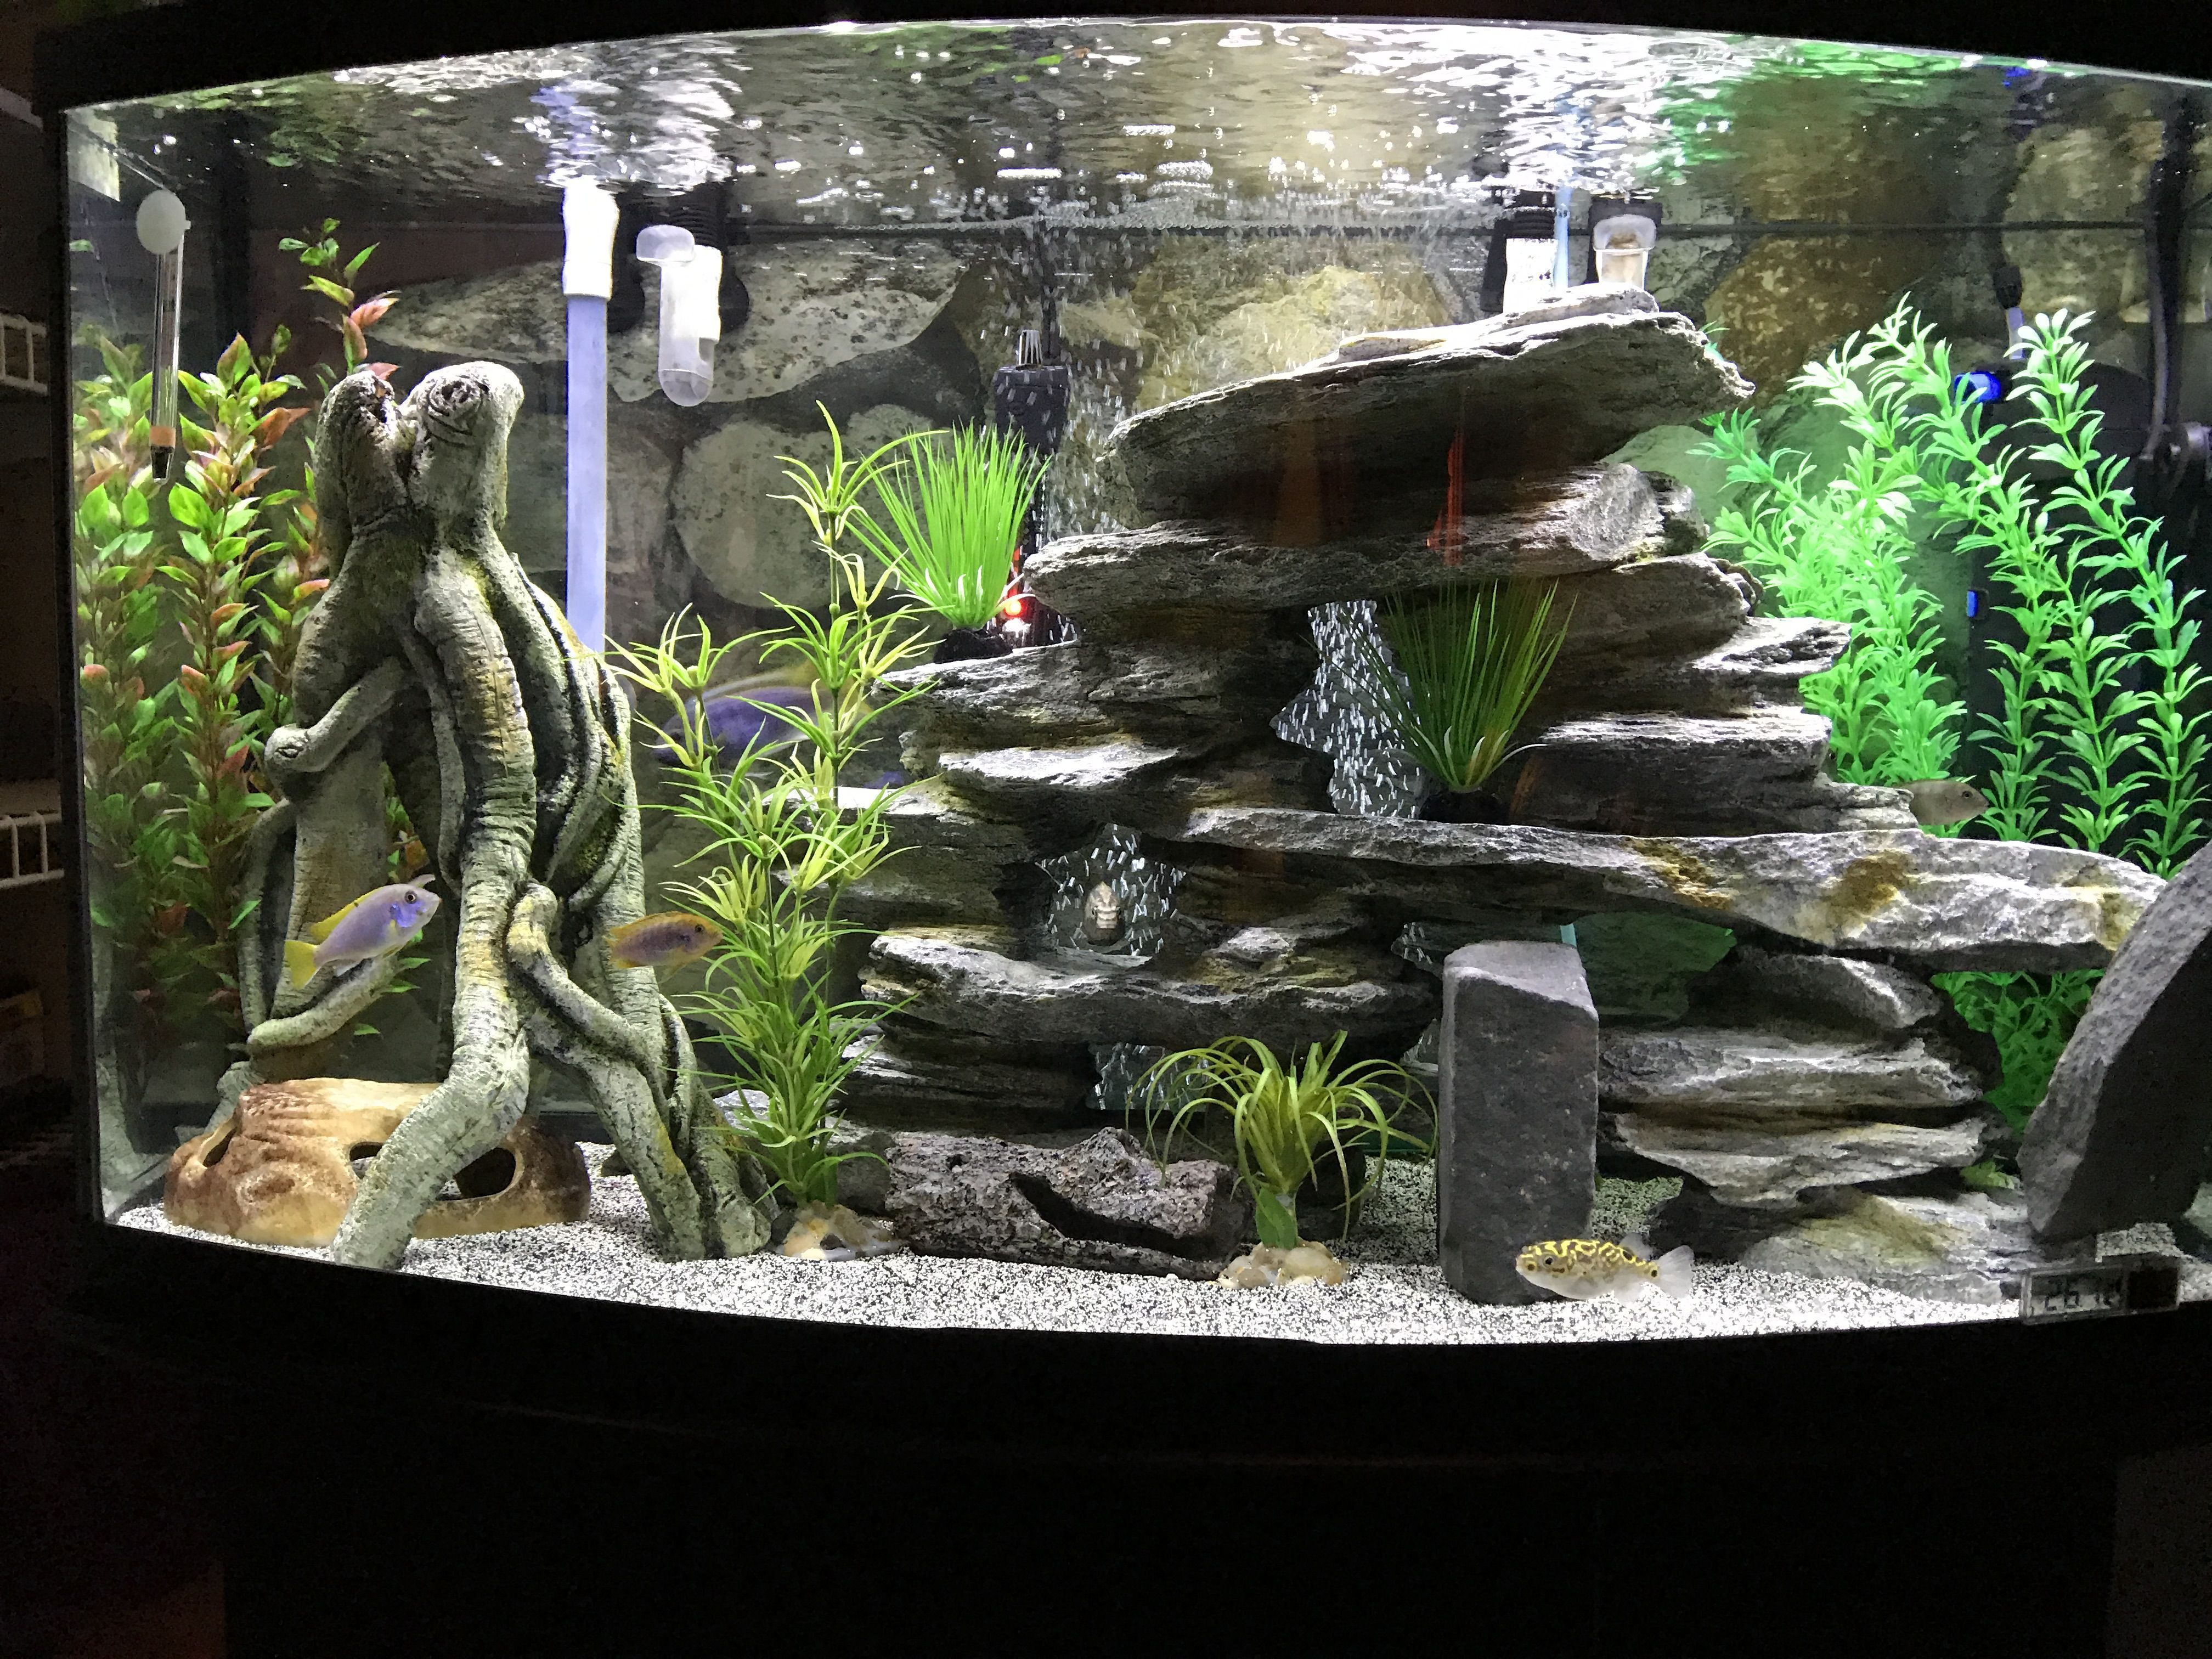 Aquariumtanksideas Tropicalfishaquariumideas Tropicalfishaquariumtanksideas Fresh Water Fish Tank Fish Tank